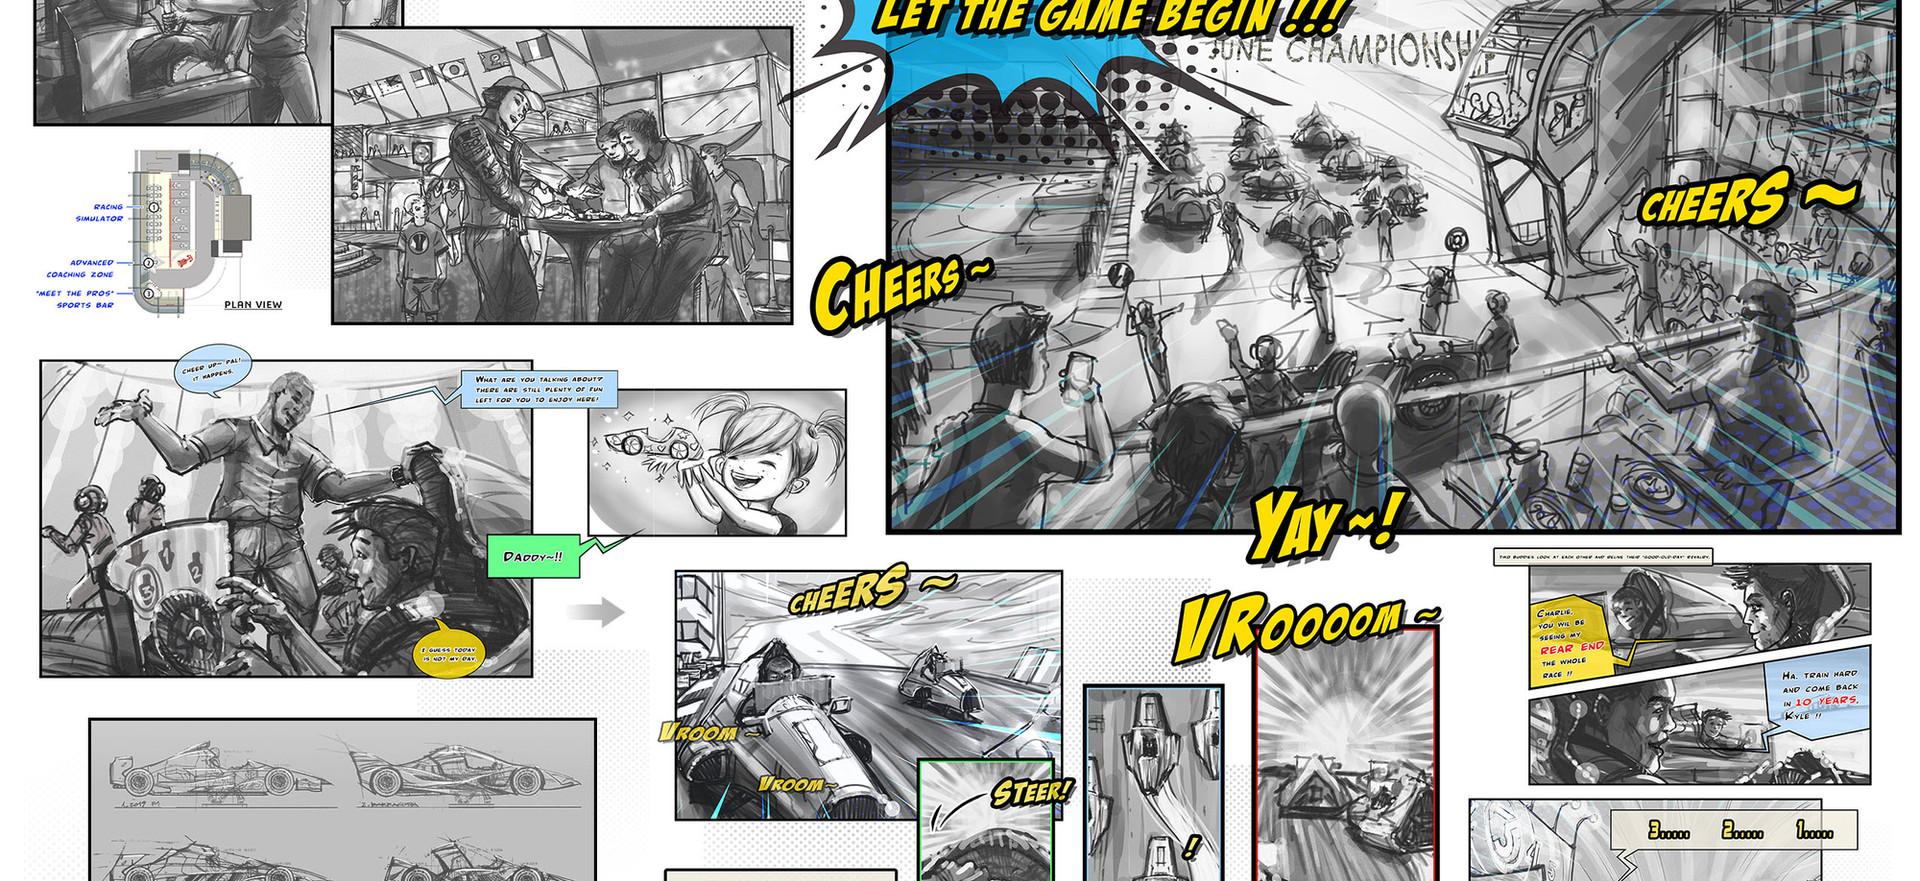 eSports Speed Race Concept Design & Storyboard